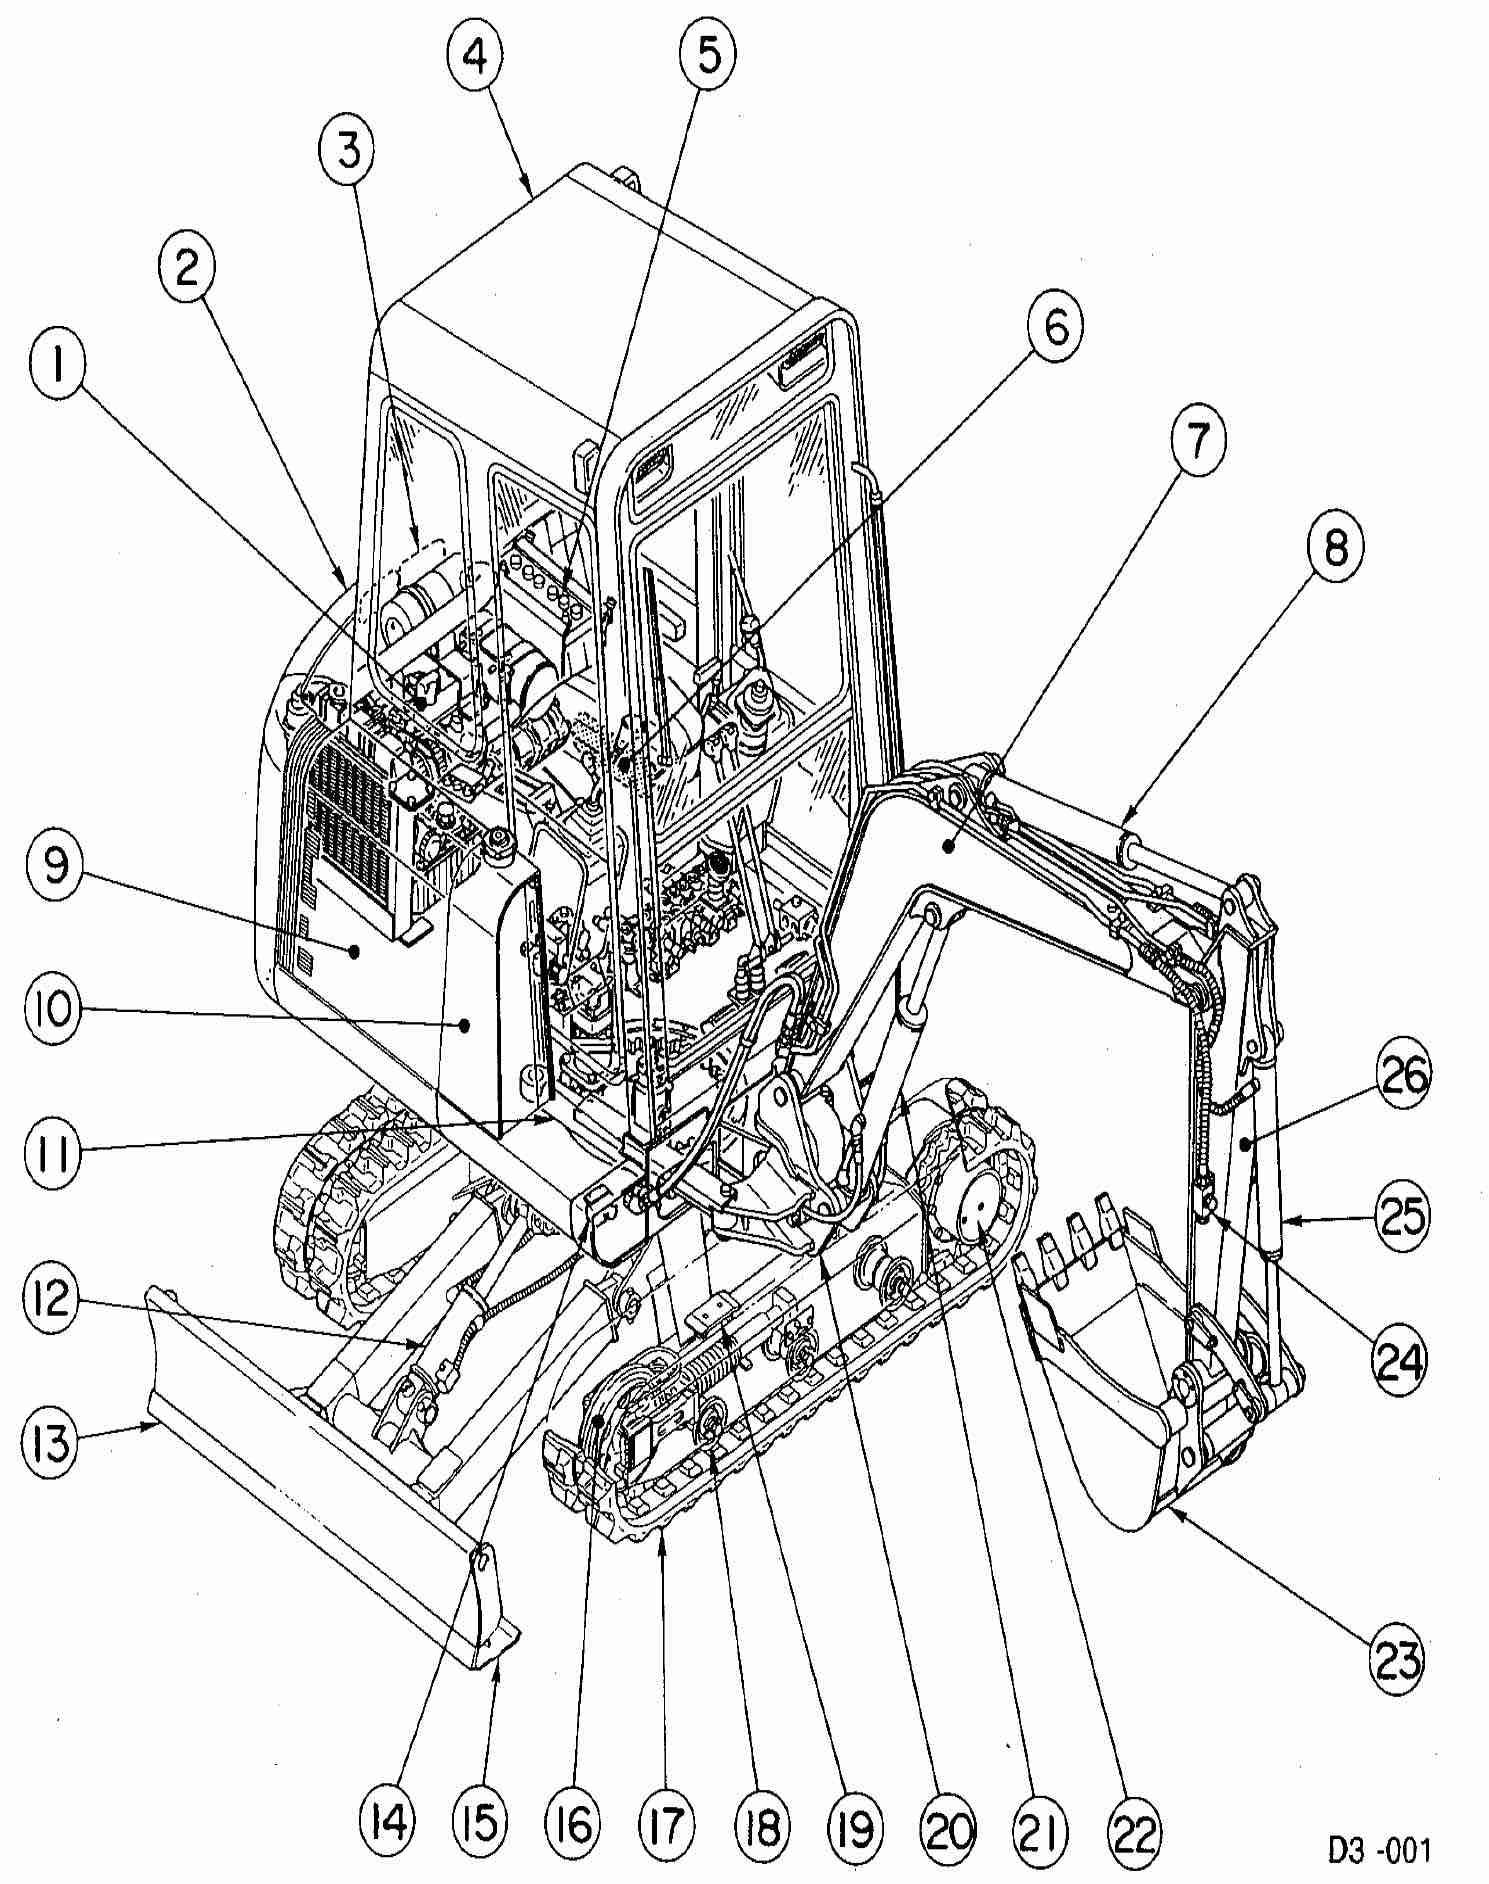 Takeuchi Compact Excavator TB020 Factory Service & Shop